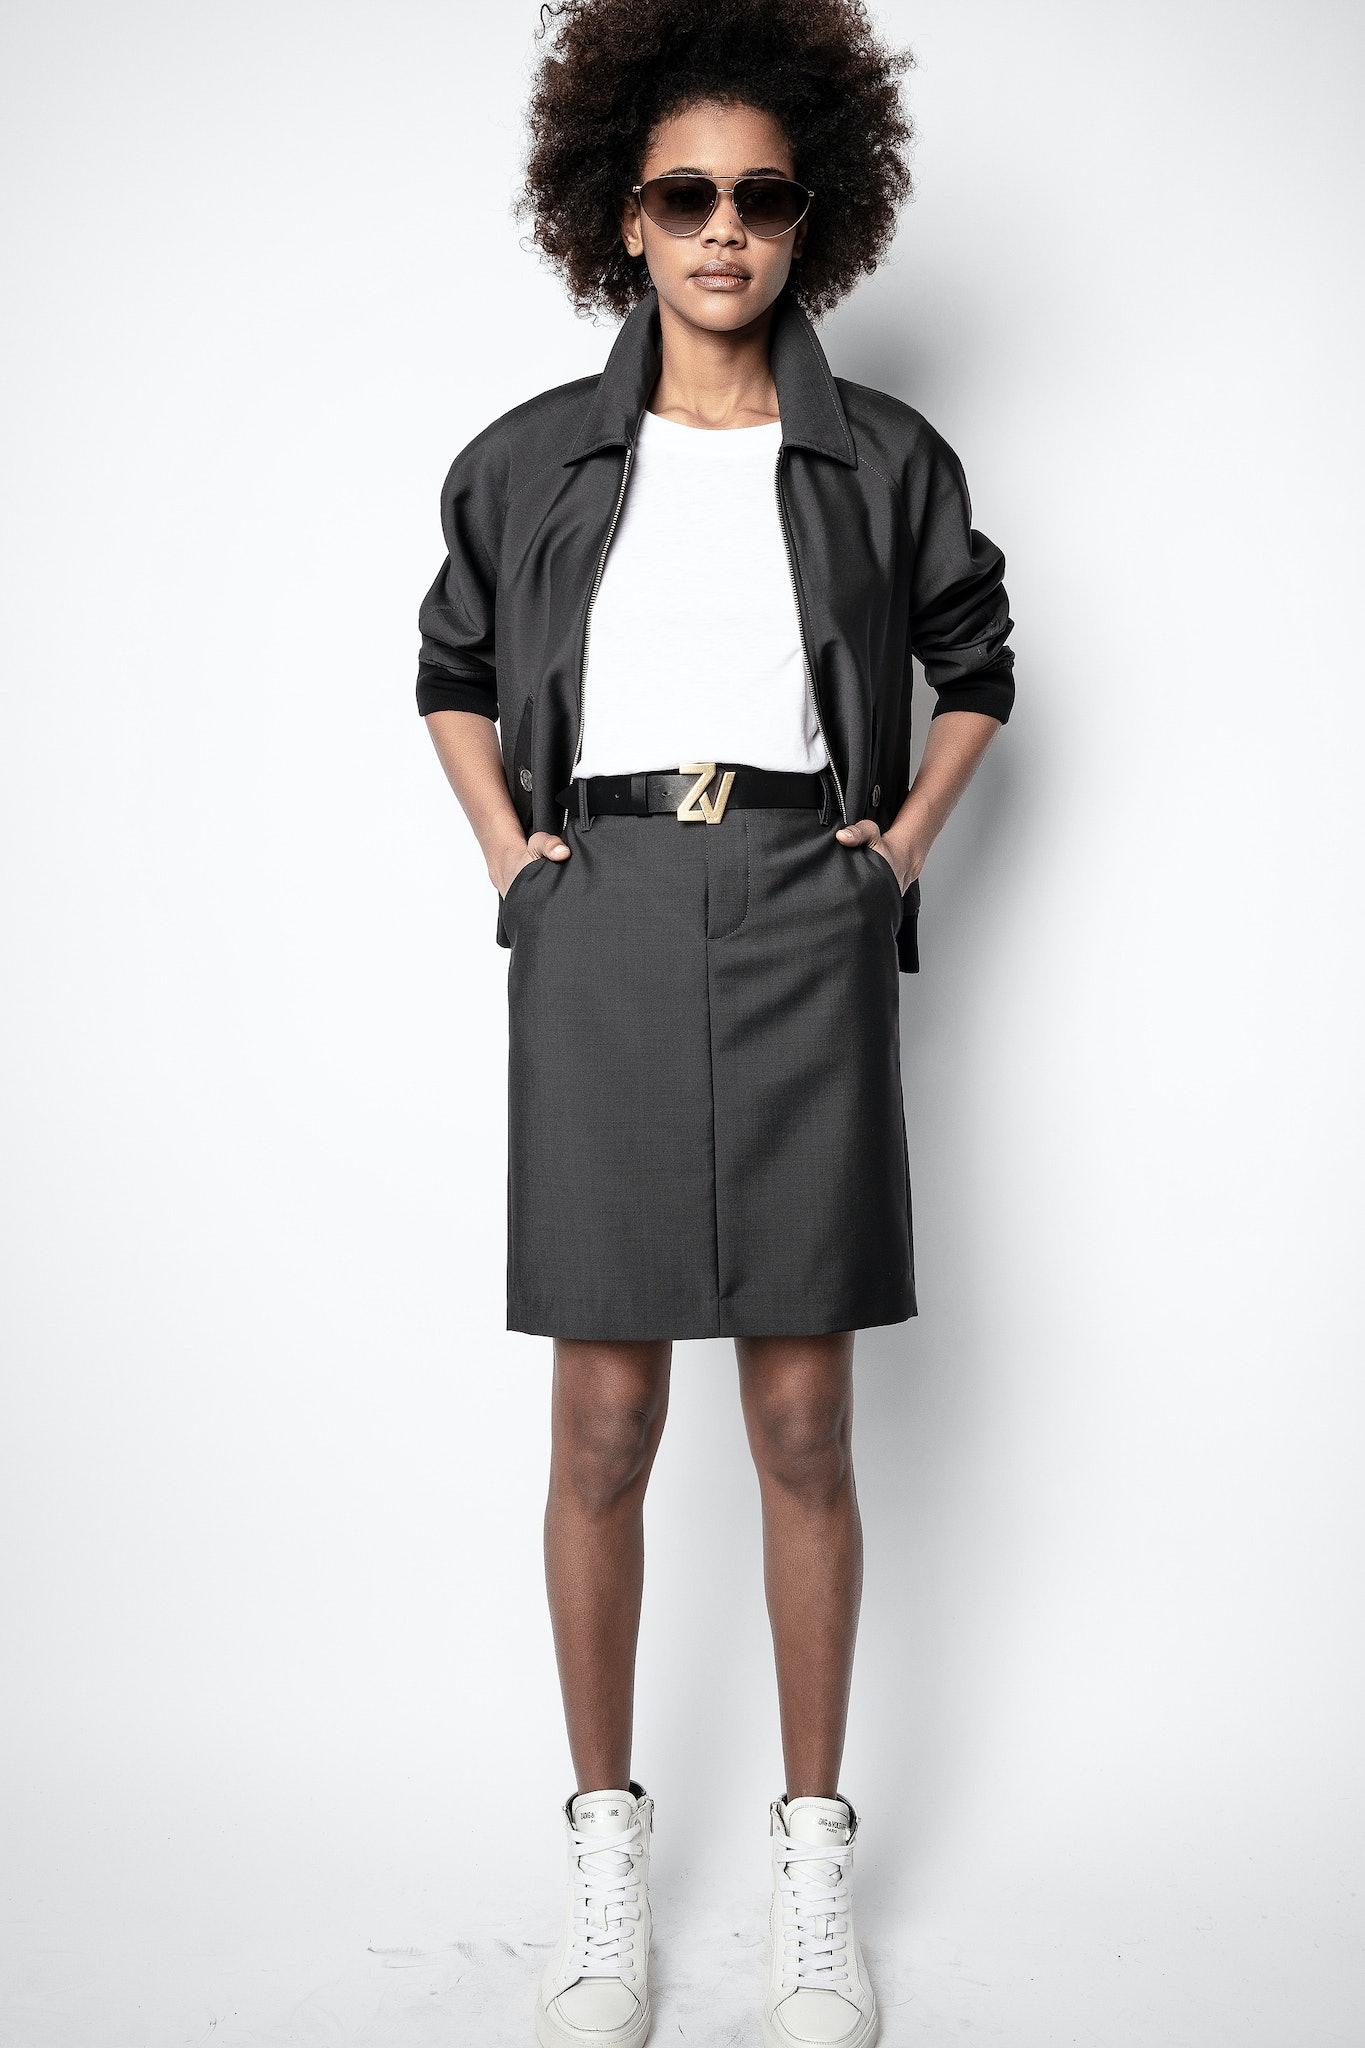 Jaxx Skirt